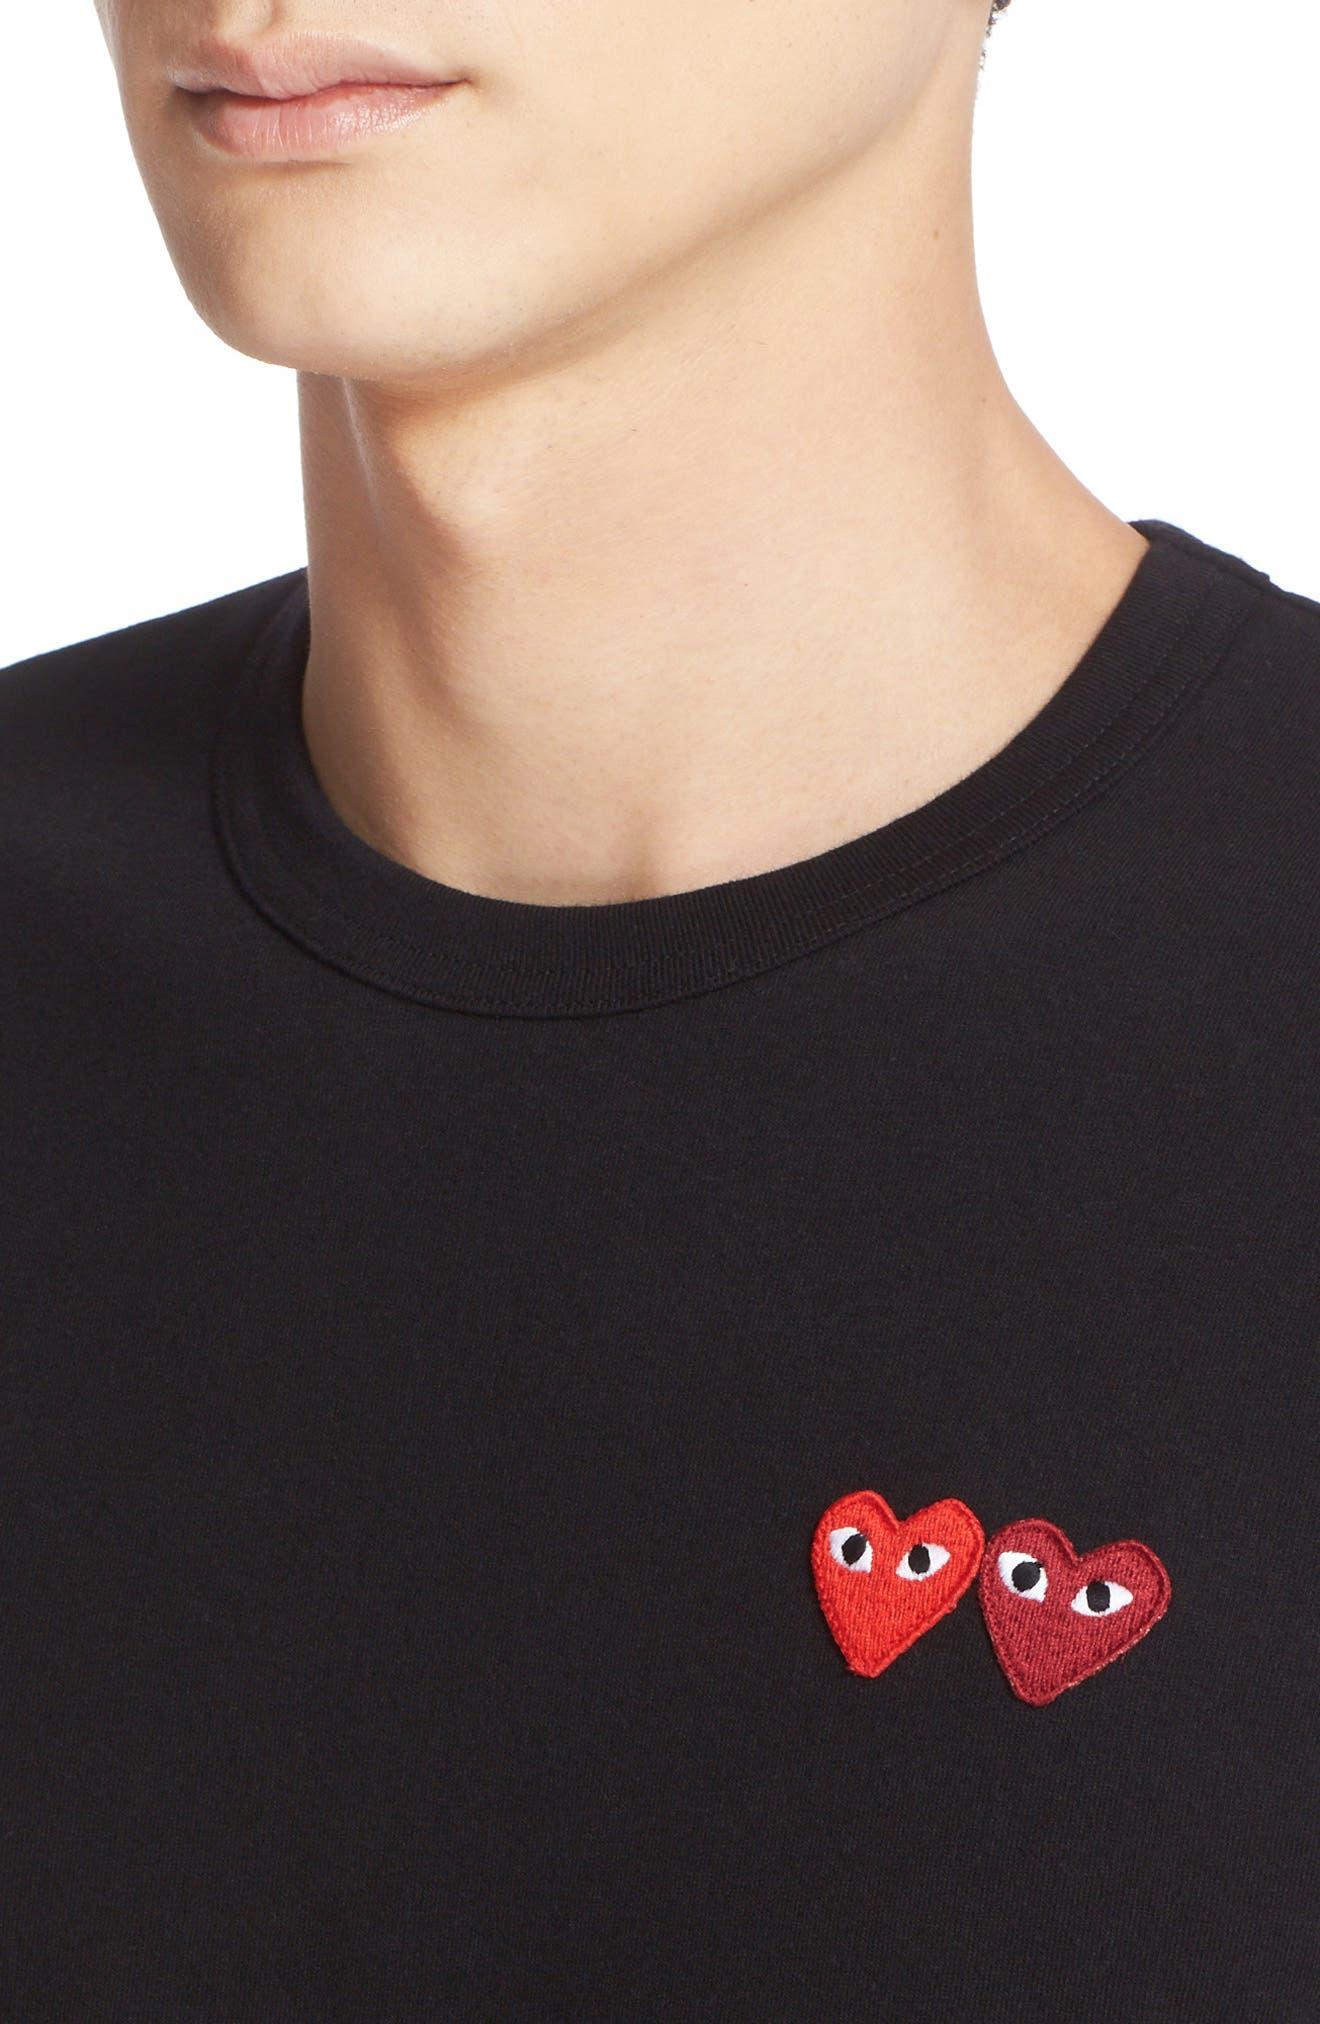 Twin Hearts Jersey T-Shirt,                             Alternate thumbnail 4, color,                             BLACK